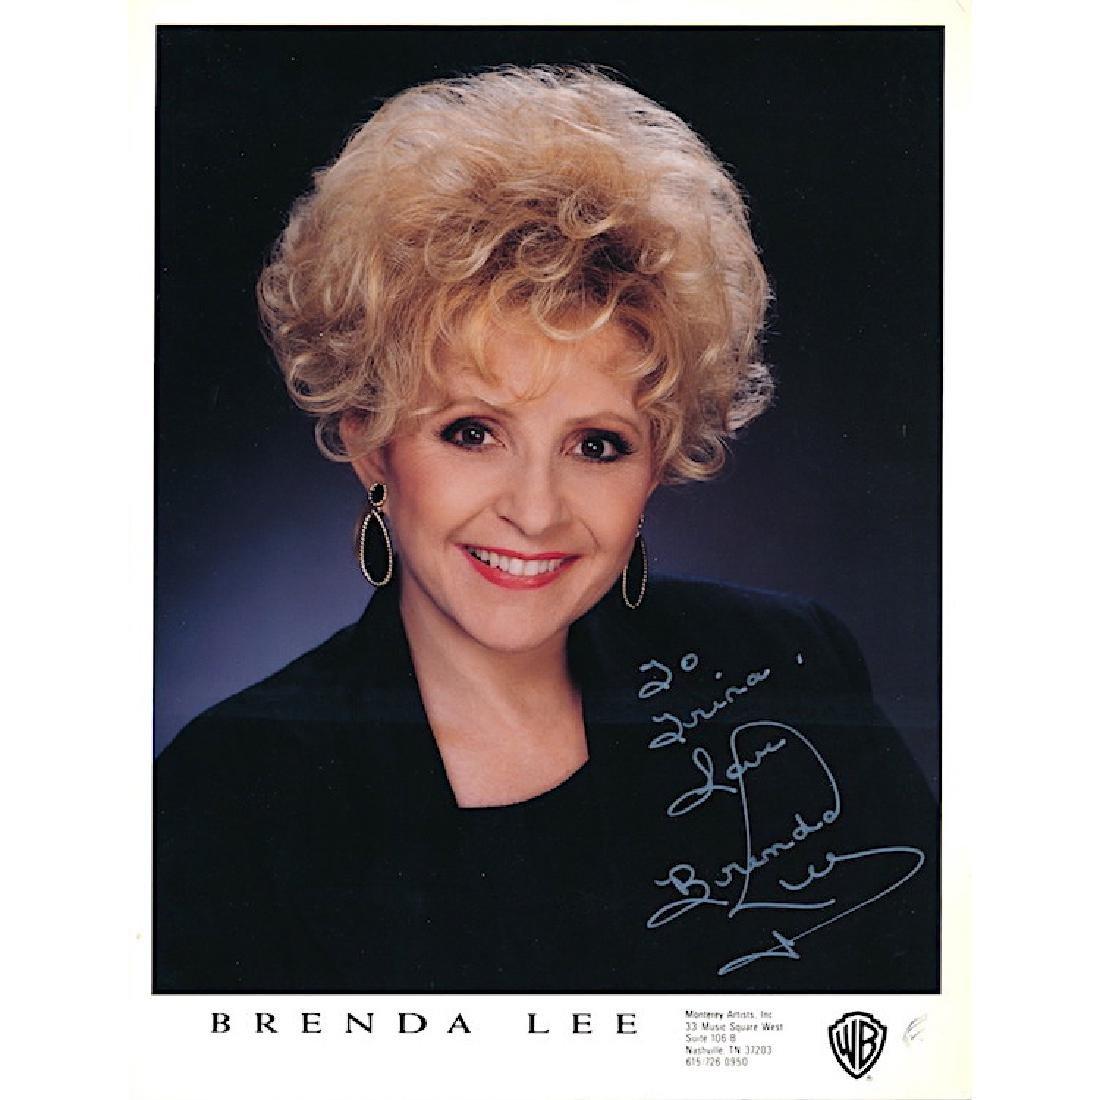 Brenda Lee Autographed Photograph